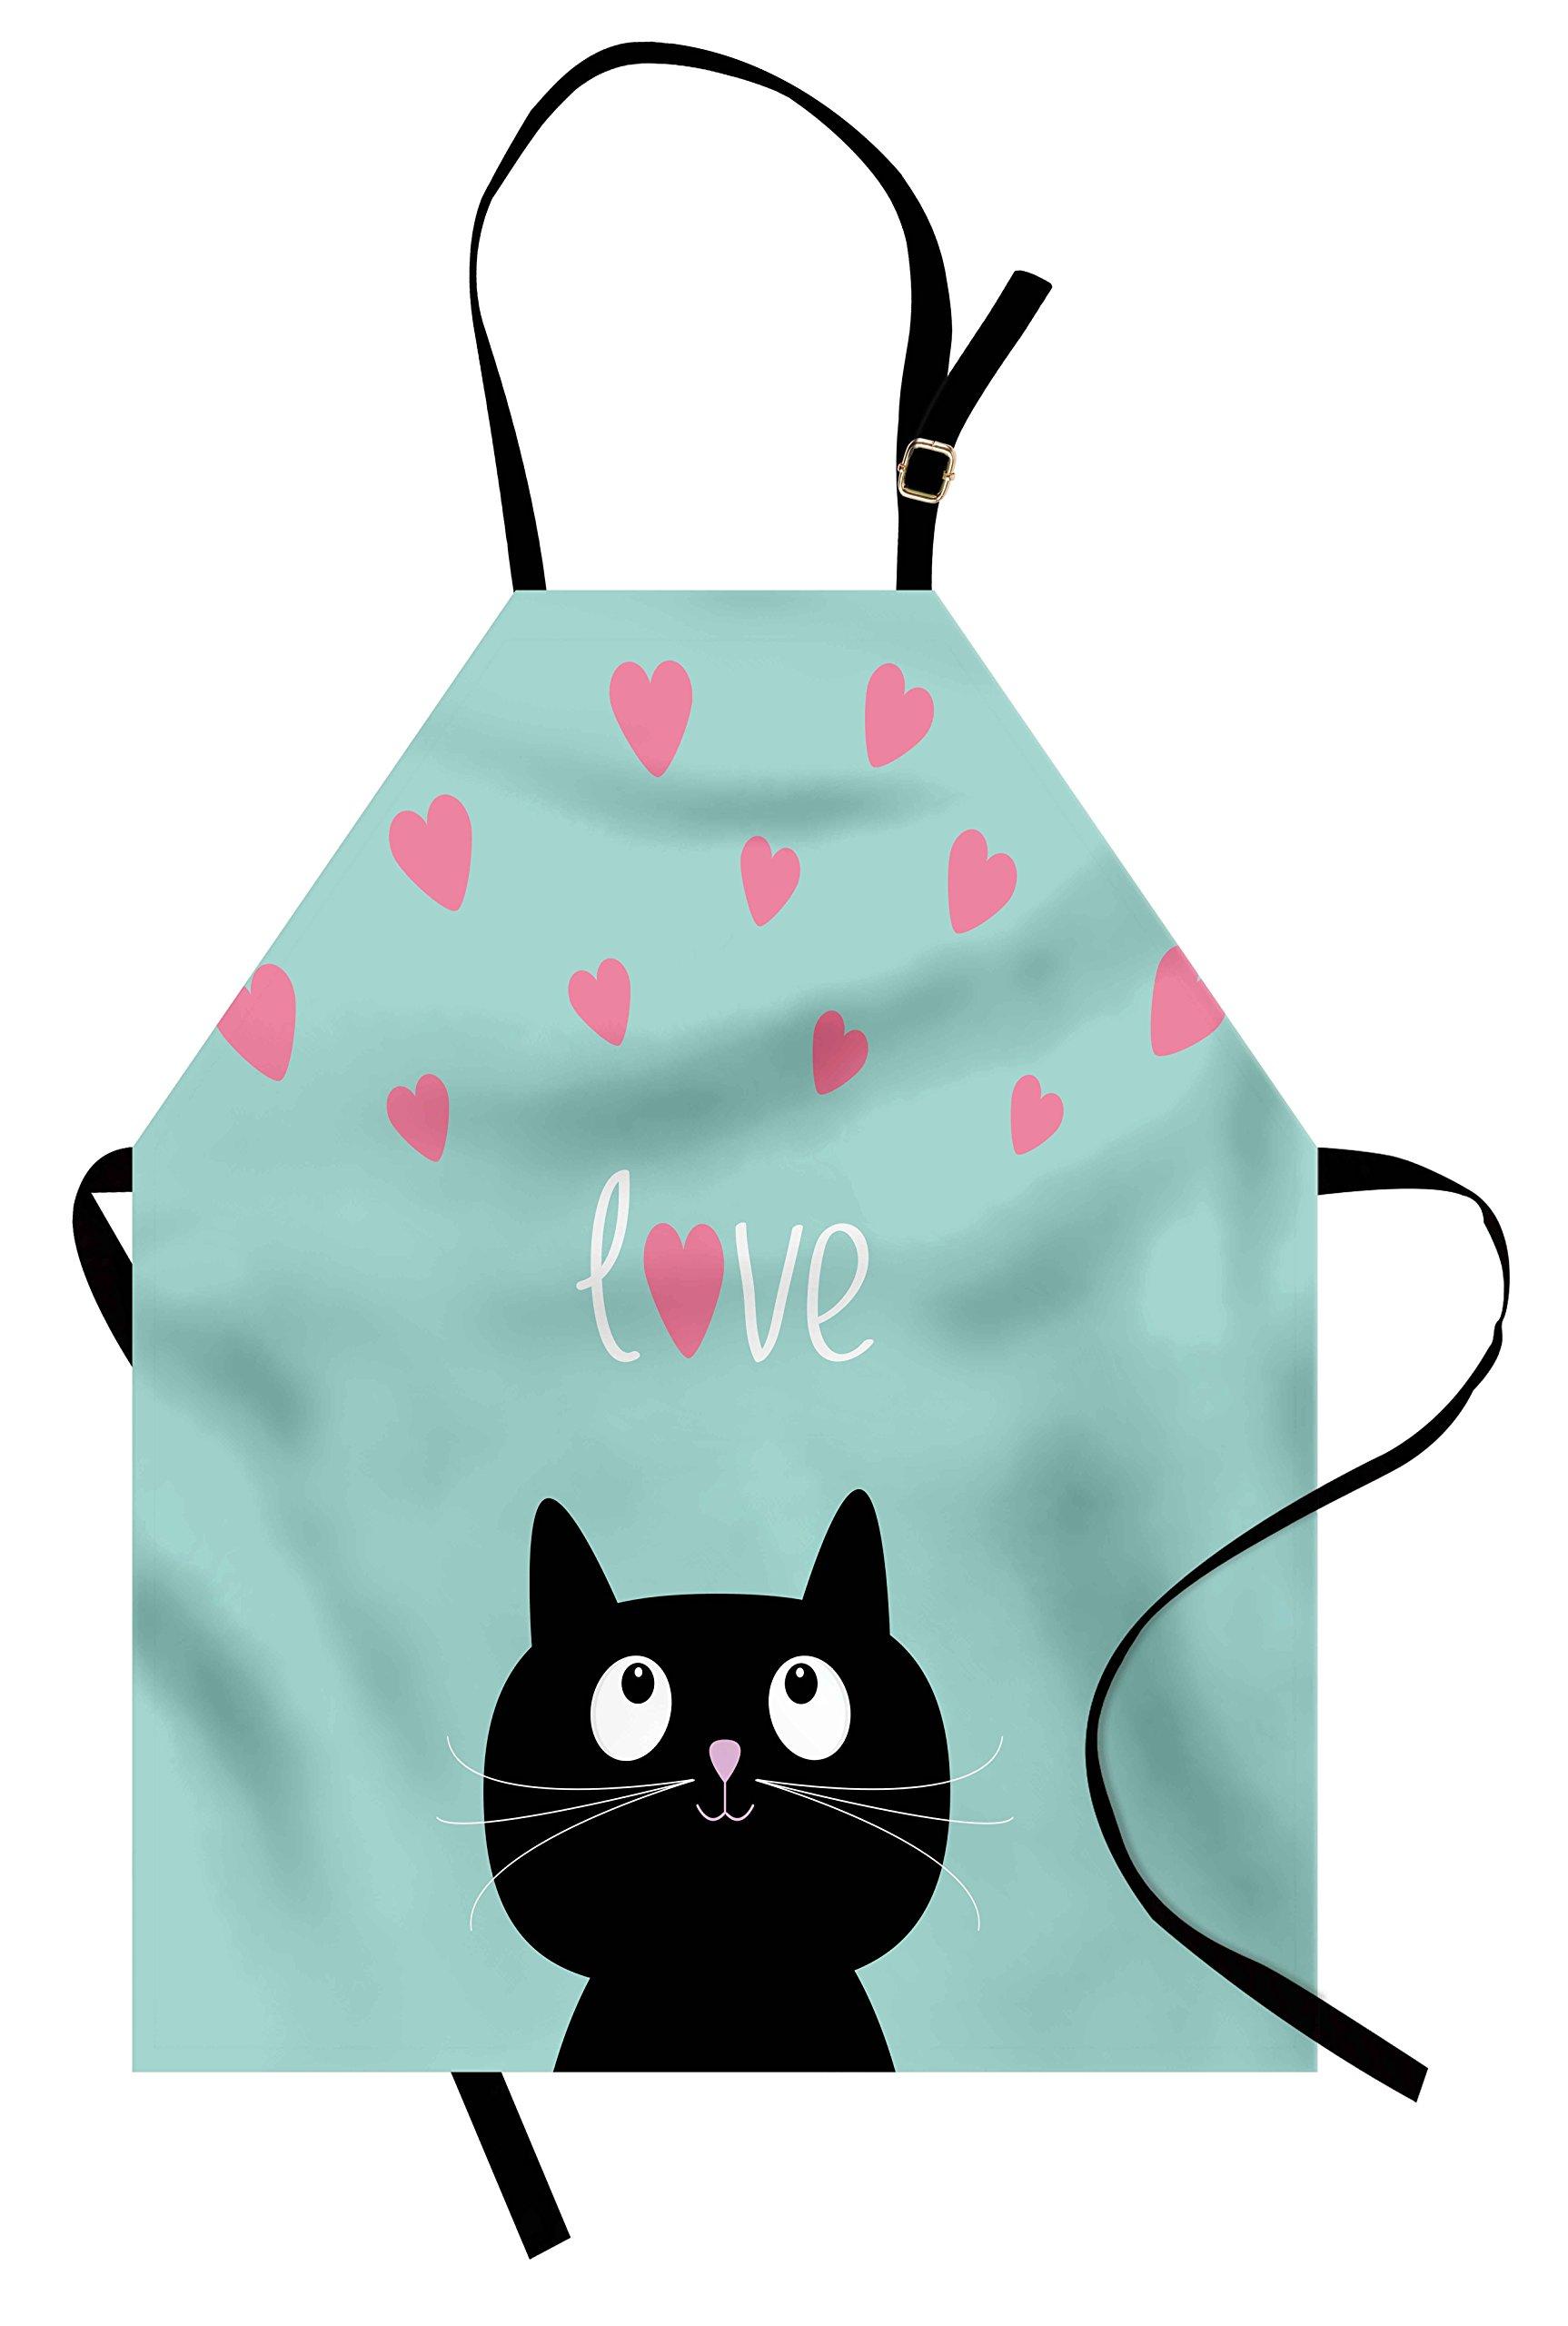 Lunarable Valentines Apron, Kitty Heart Figures Cat Lovely Companions Kids Children Illustration, Unisex Kitchen Bib Apron with Adjustable Neck for Cooking Baking Gardening, Seafoam Pink Black